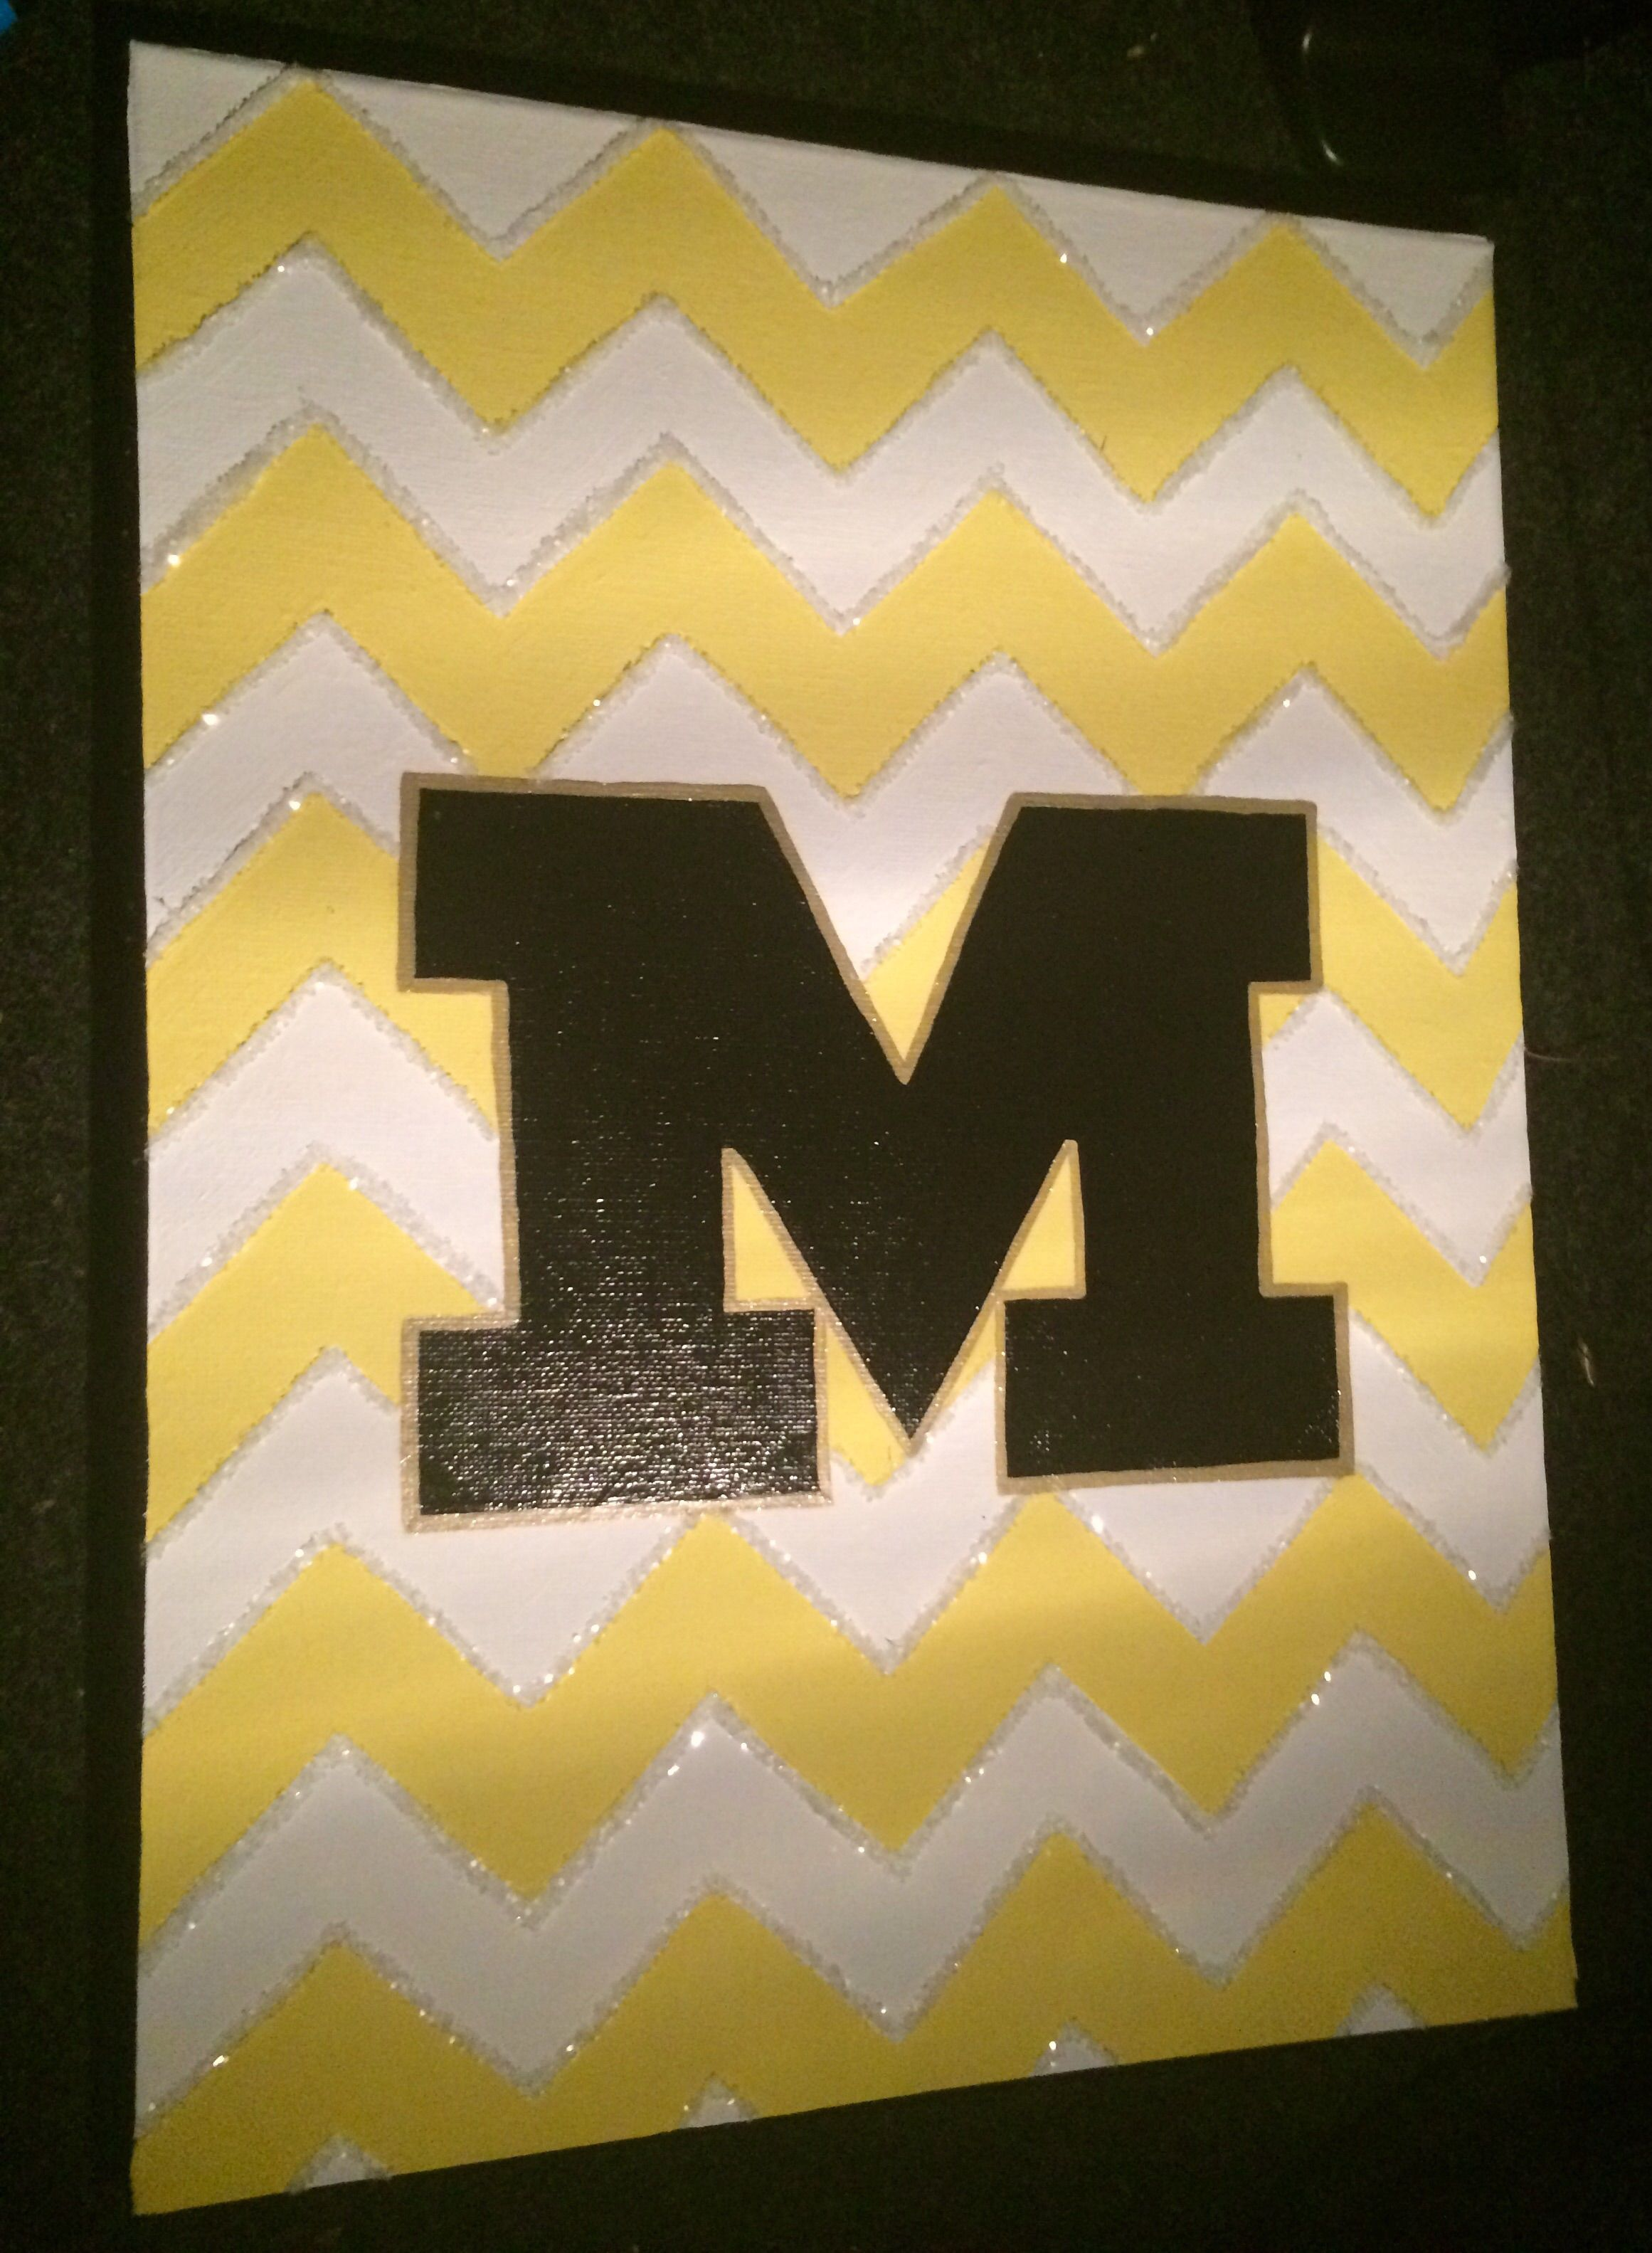 Mizzou glittery chevron canvas painting | College DIY | Pinterest ...